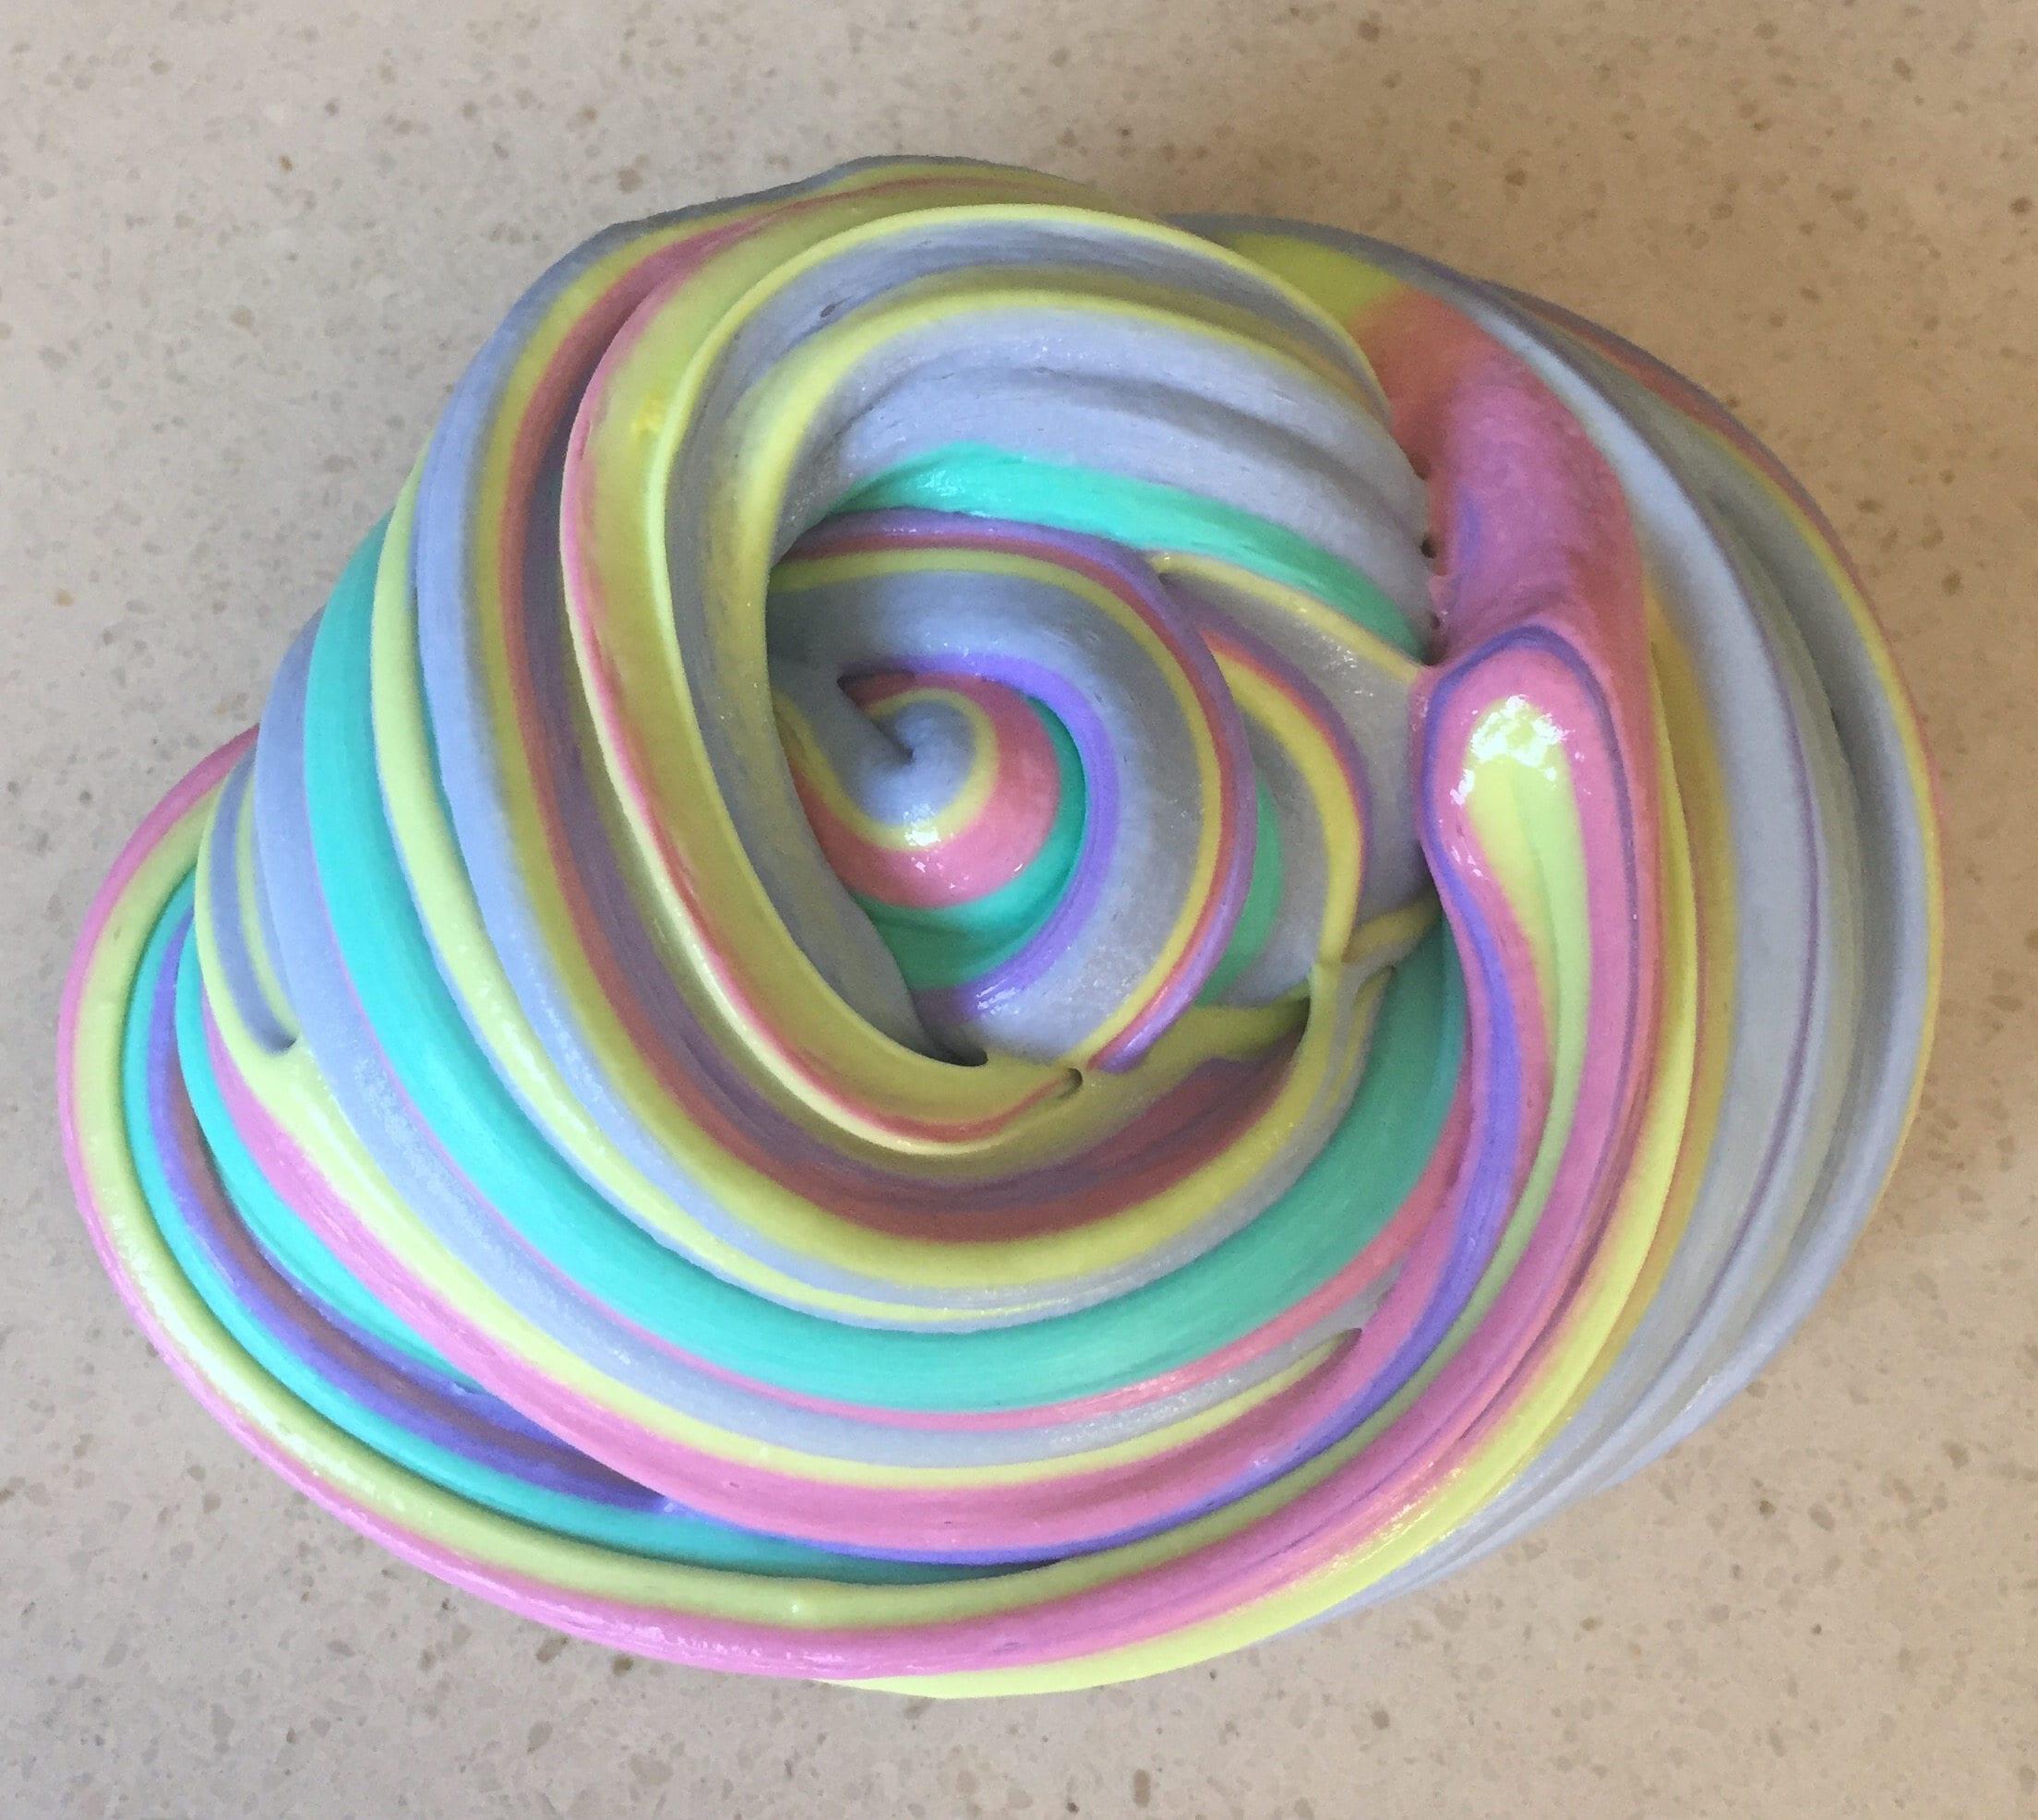 Squishy Bunny Slime Instagram : Huge 12oz Fluffy Instagram Rainbow Slime Squishy Sensory Play